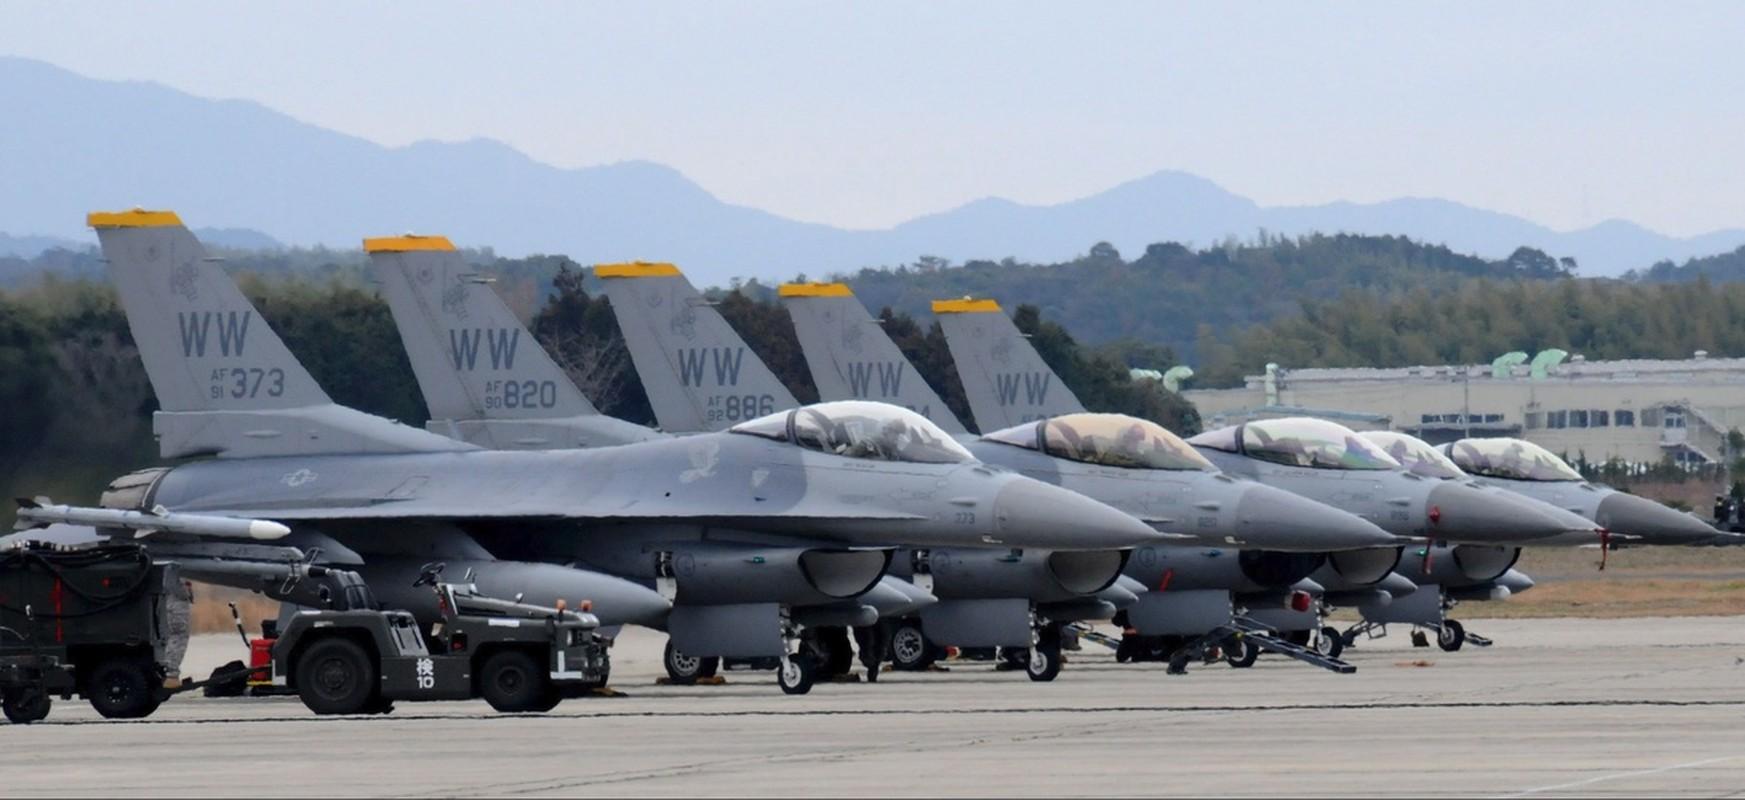 Dai Loan kich hoat Phi doi tiem kich F-16V dau tien, san sang nghenh chien-Hinh-6